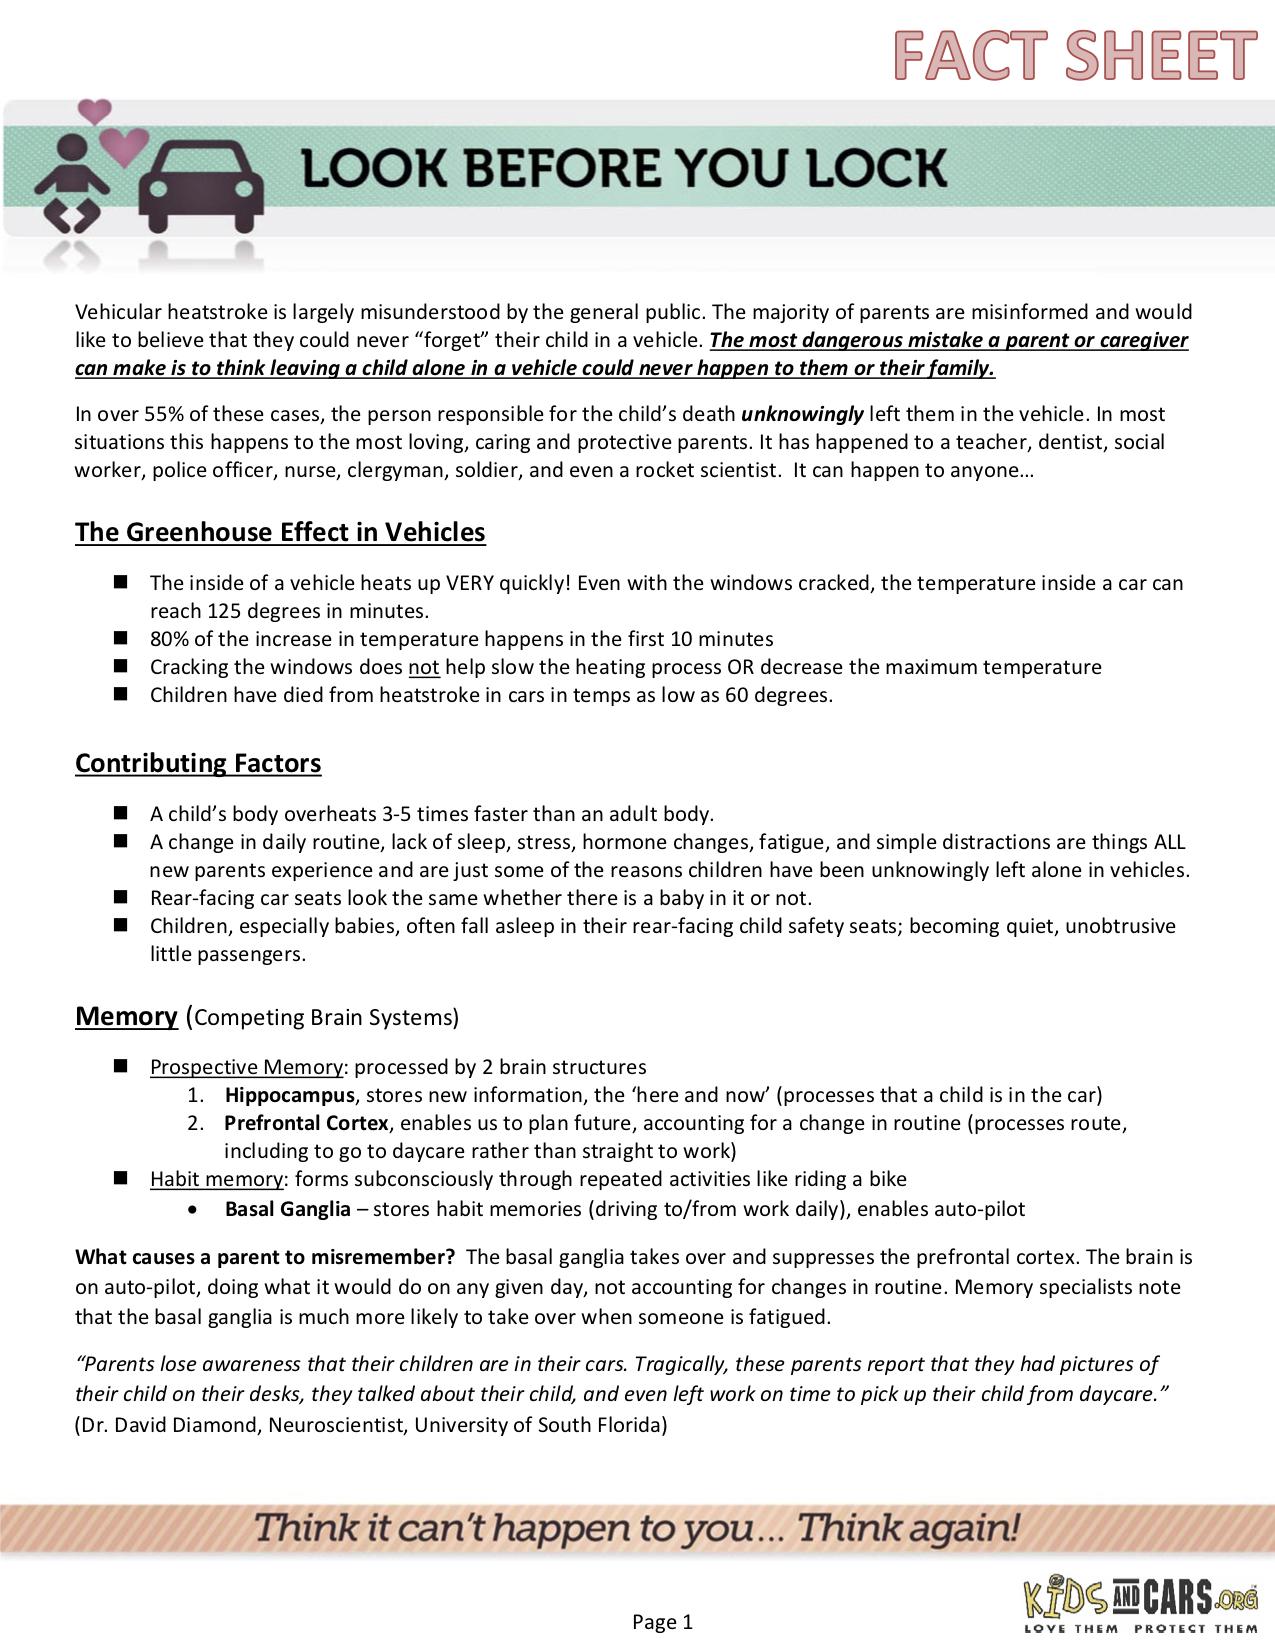 Heatstroke-fact-sheet-2018-2.jpg